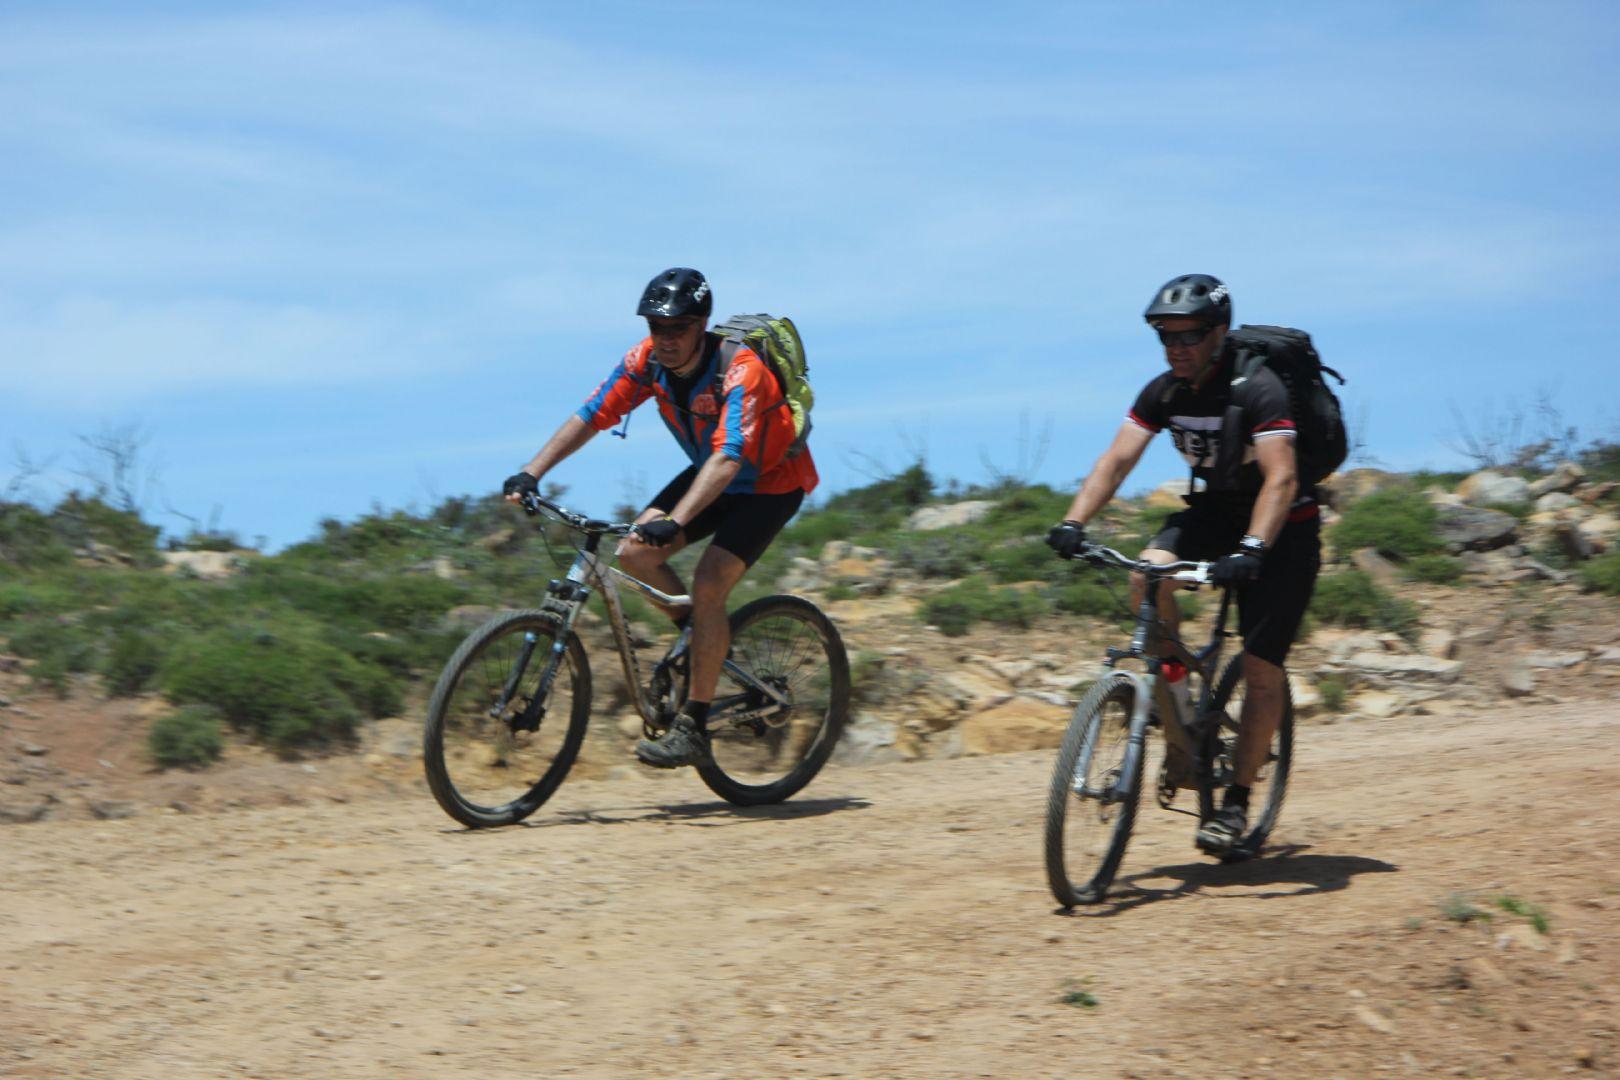 IMG_9260.JPG - Spain - Trans Andaluz - Mountain Biking